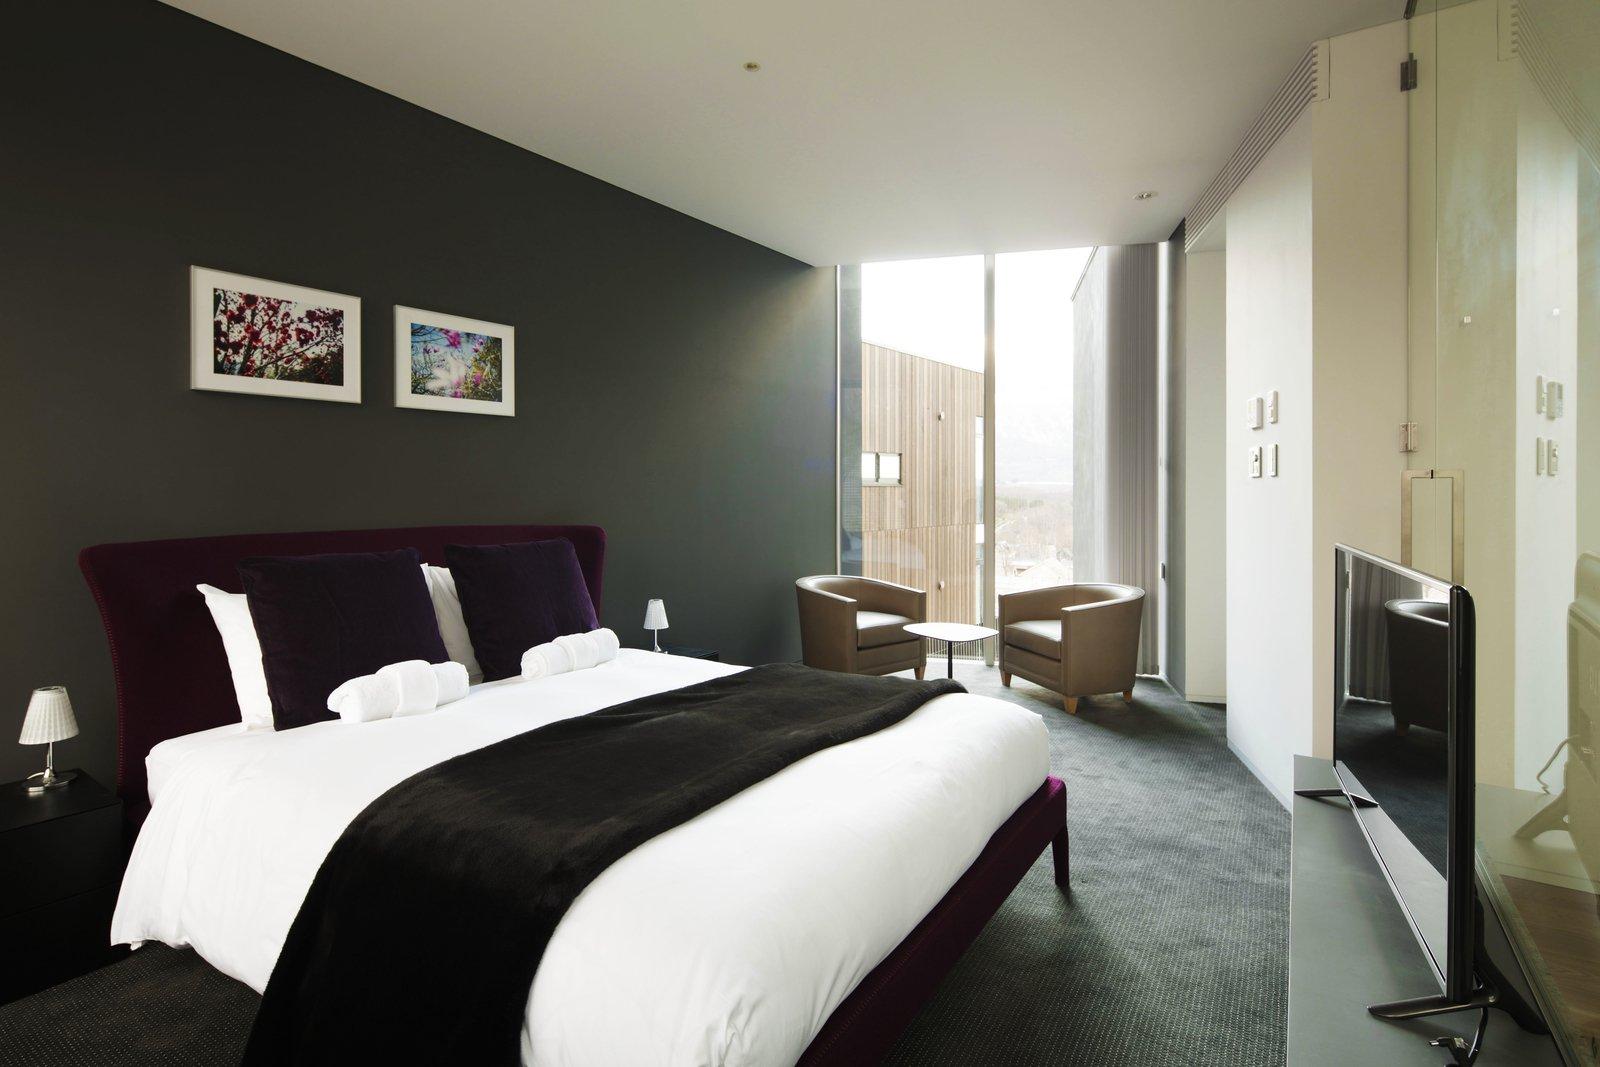 Terrazze 301 yotei master bedroom large